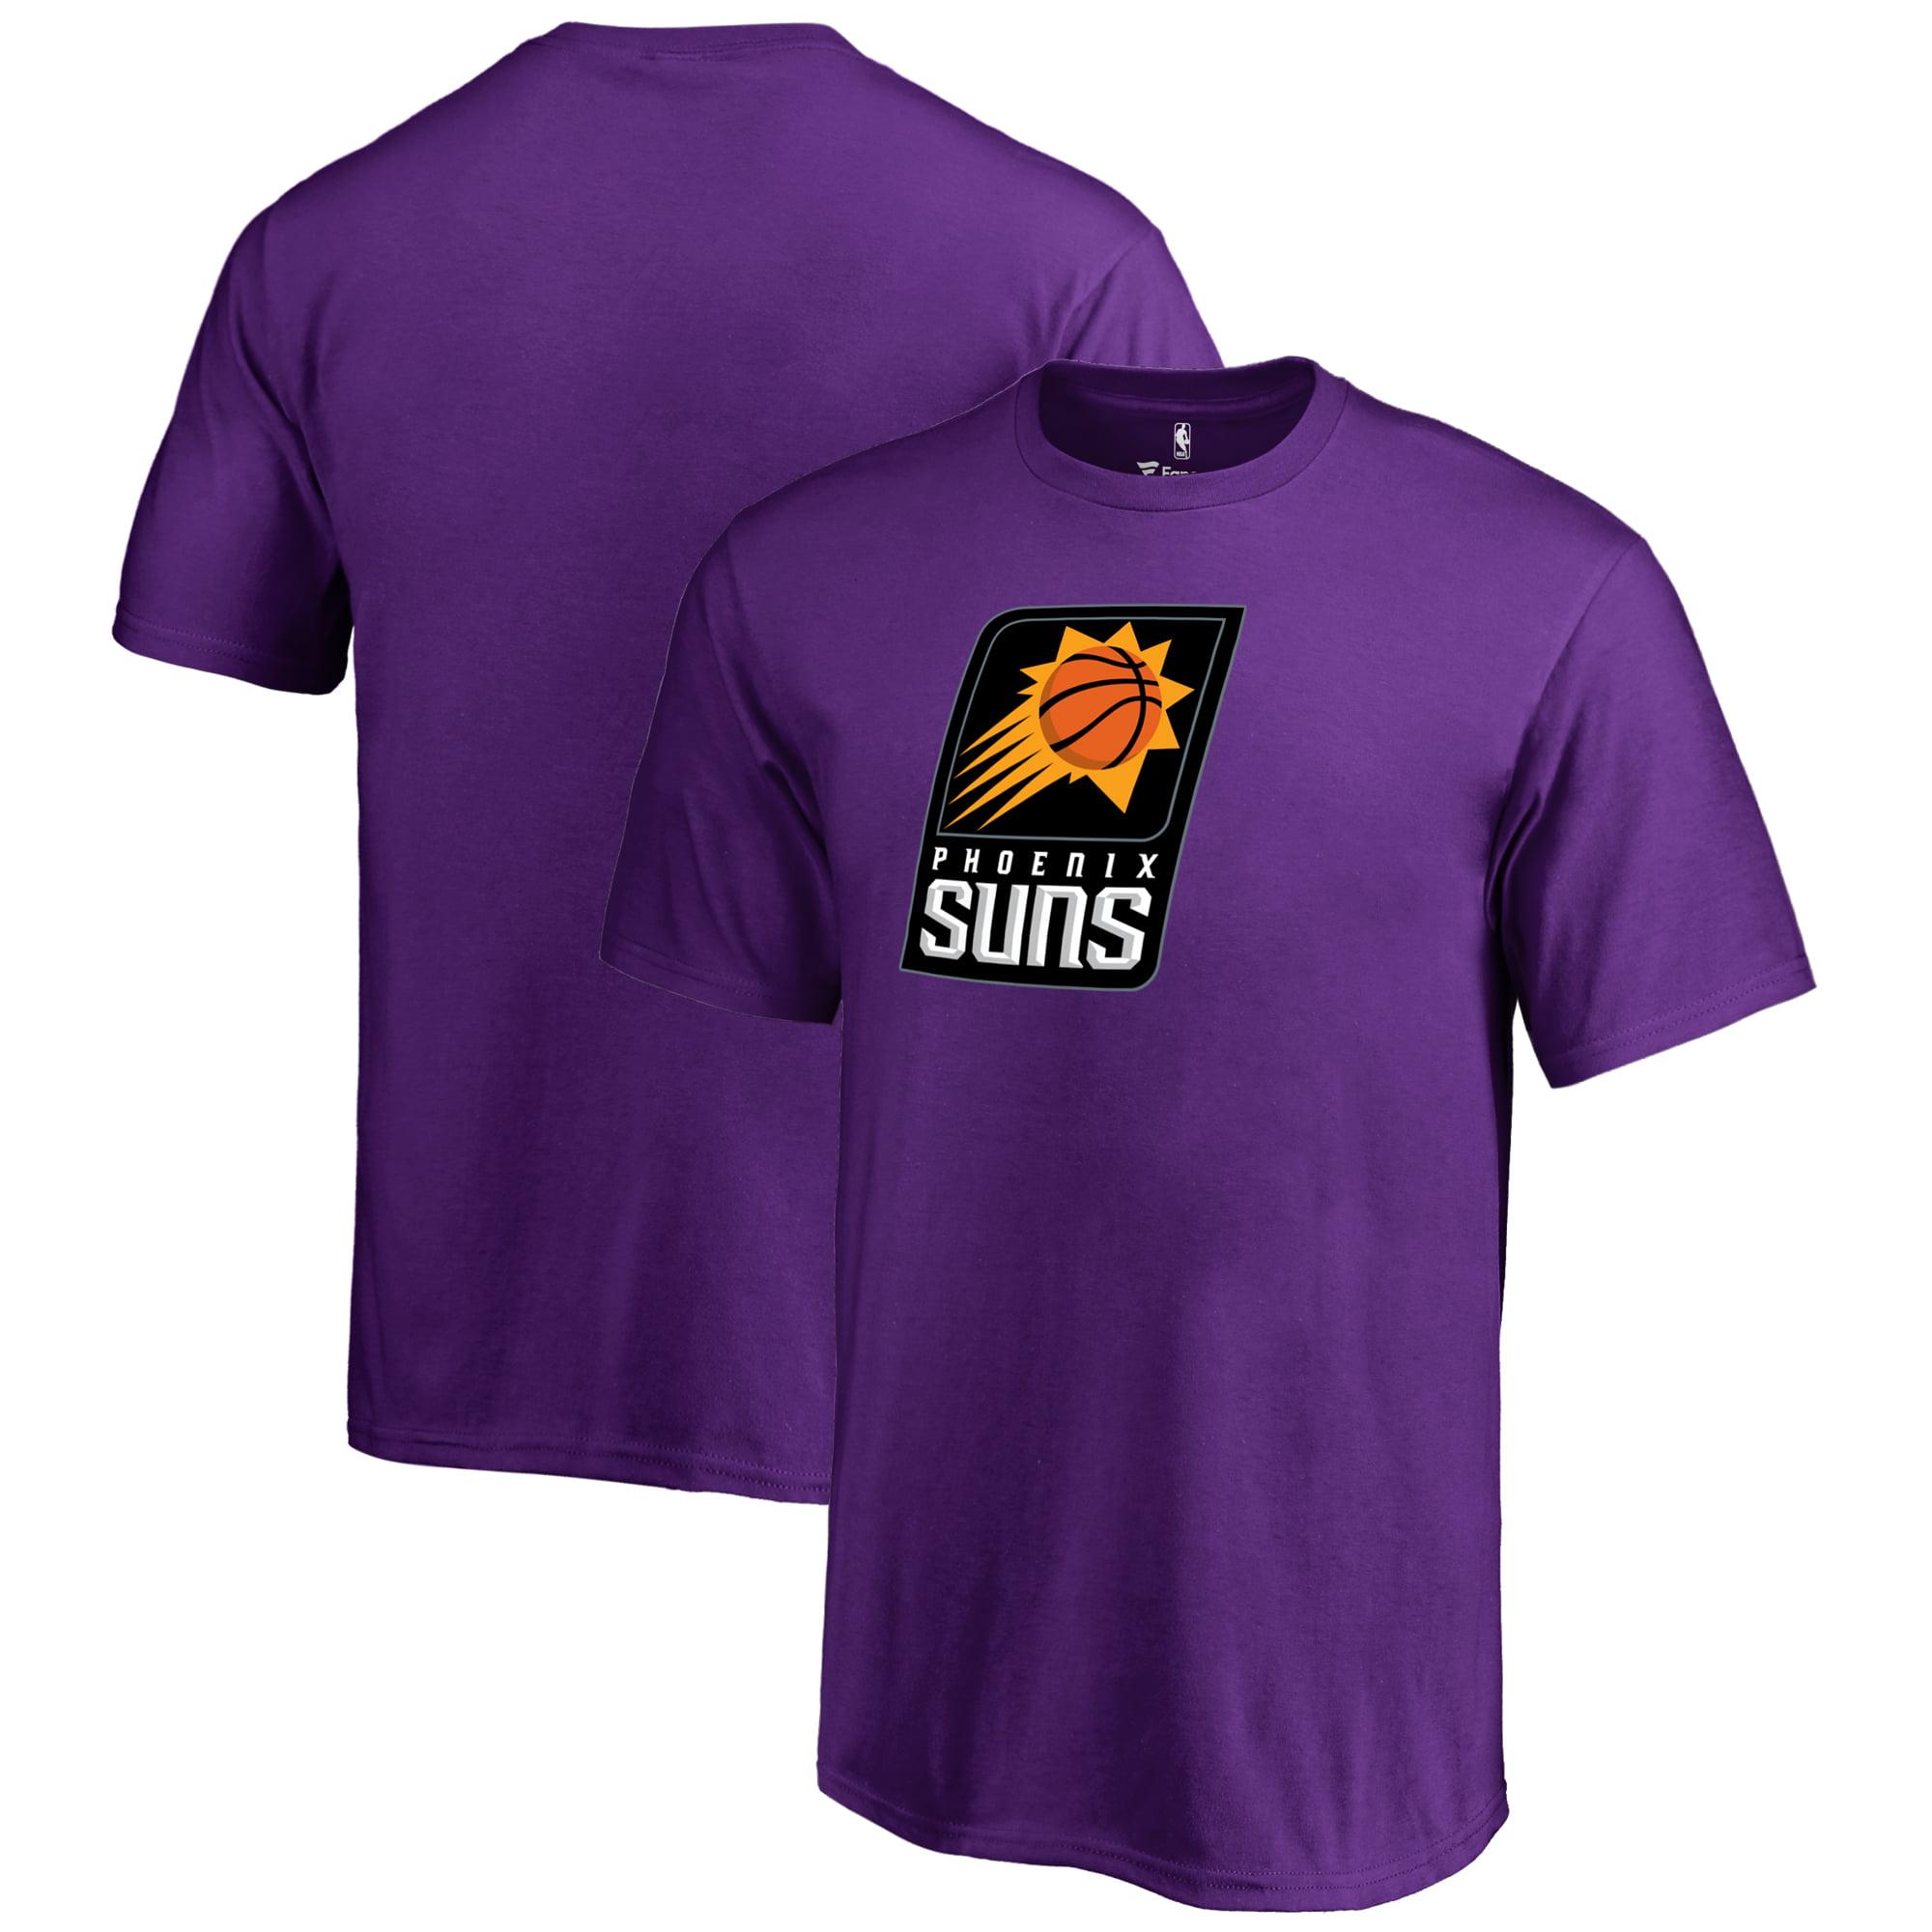 Phoenix Suns Fanatics Branded Youth Primary Logo T-Shirt - Purple